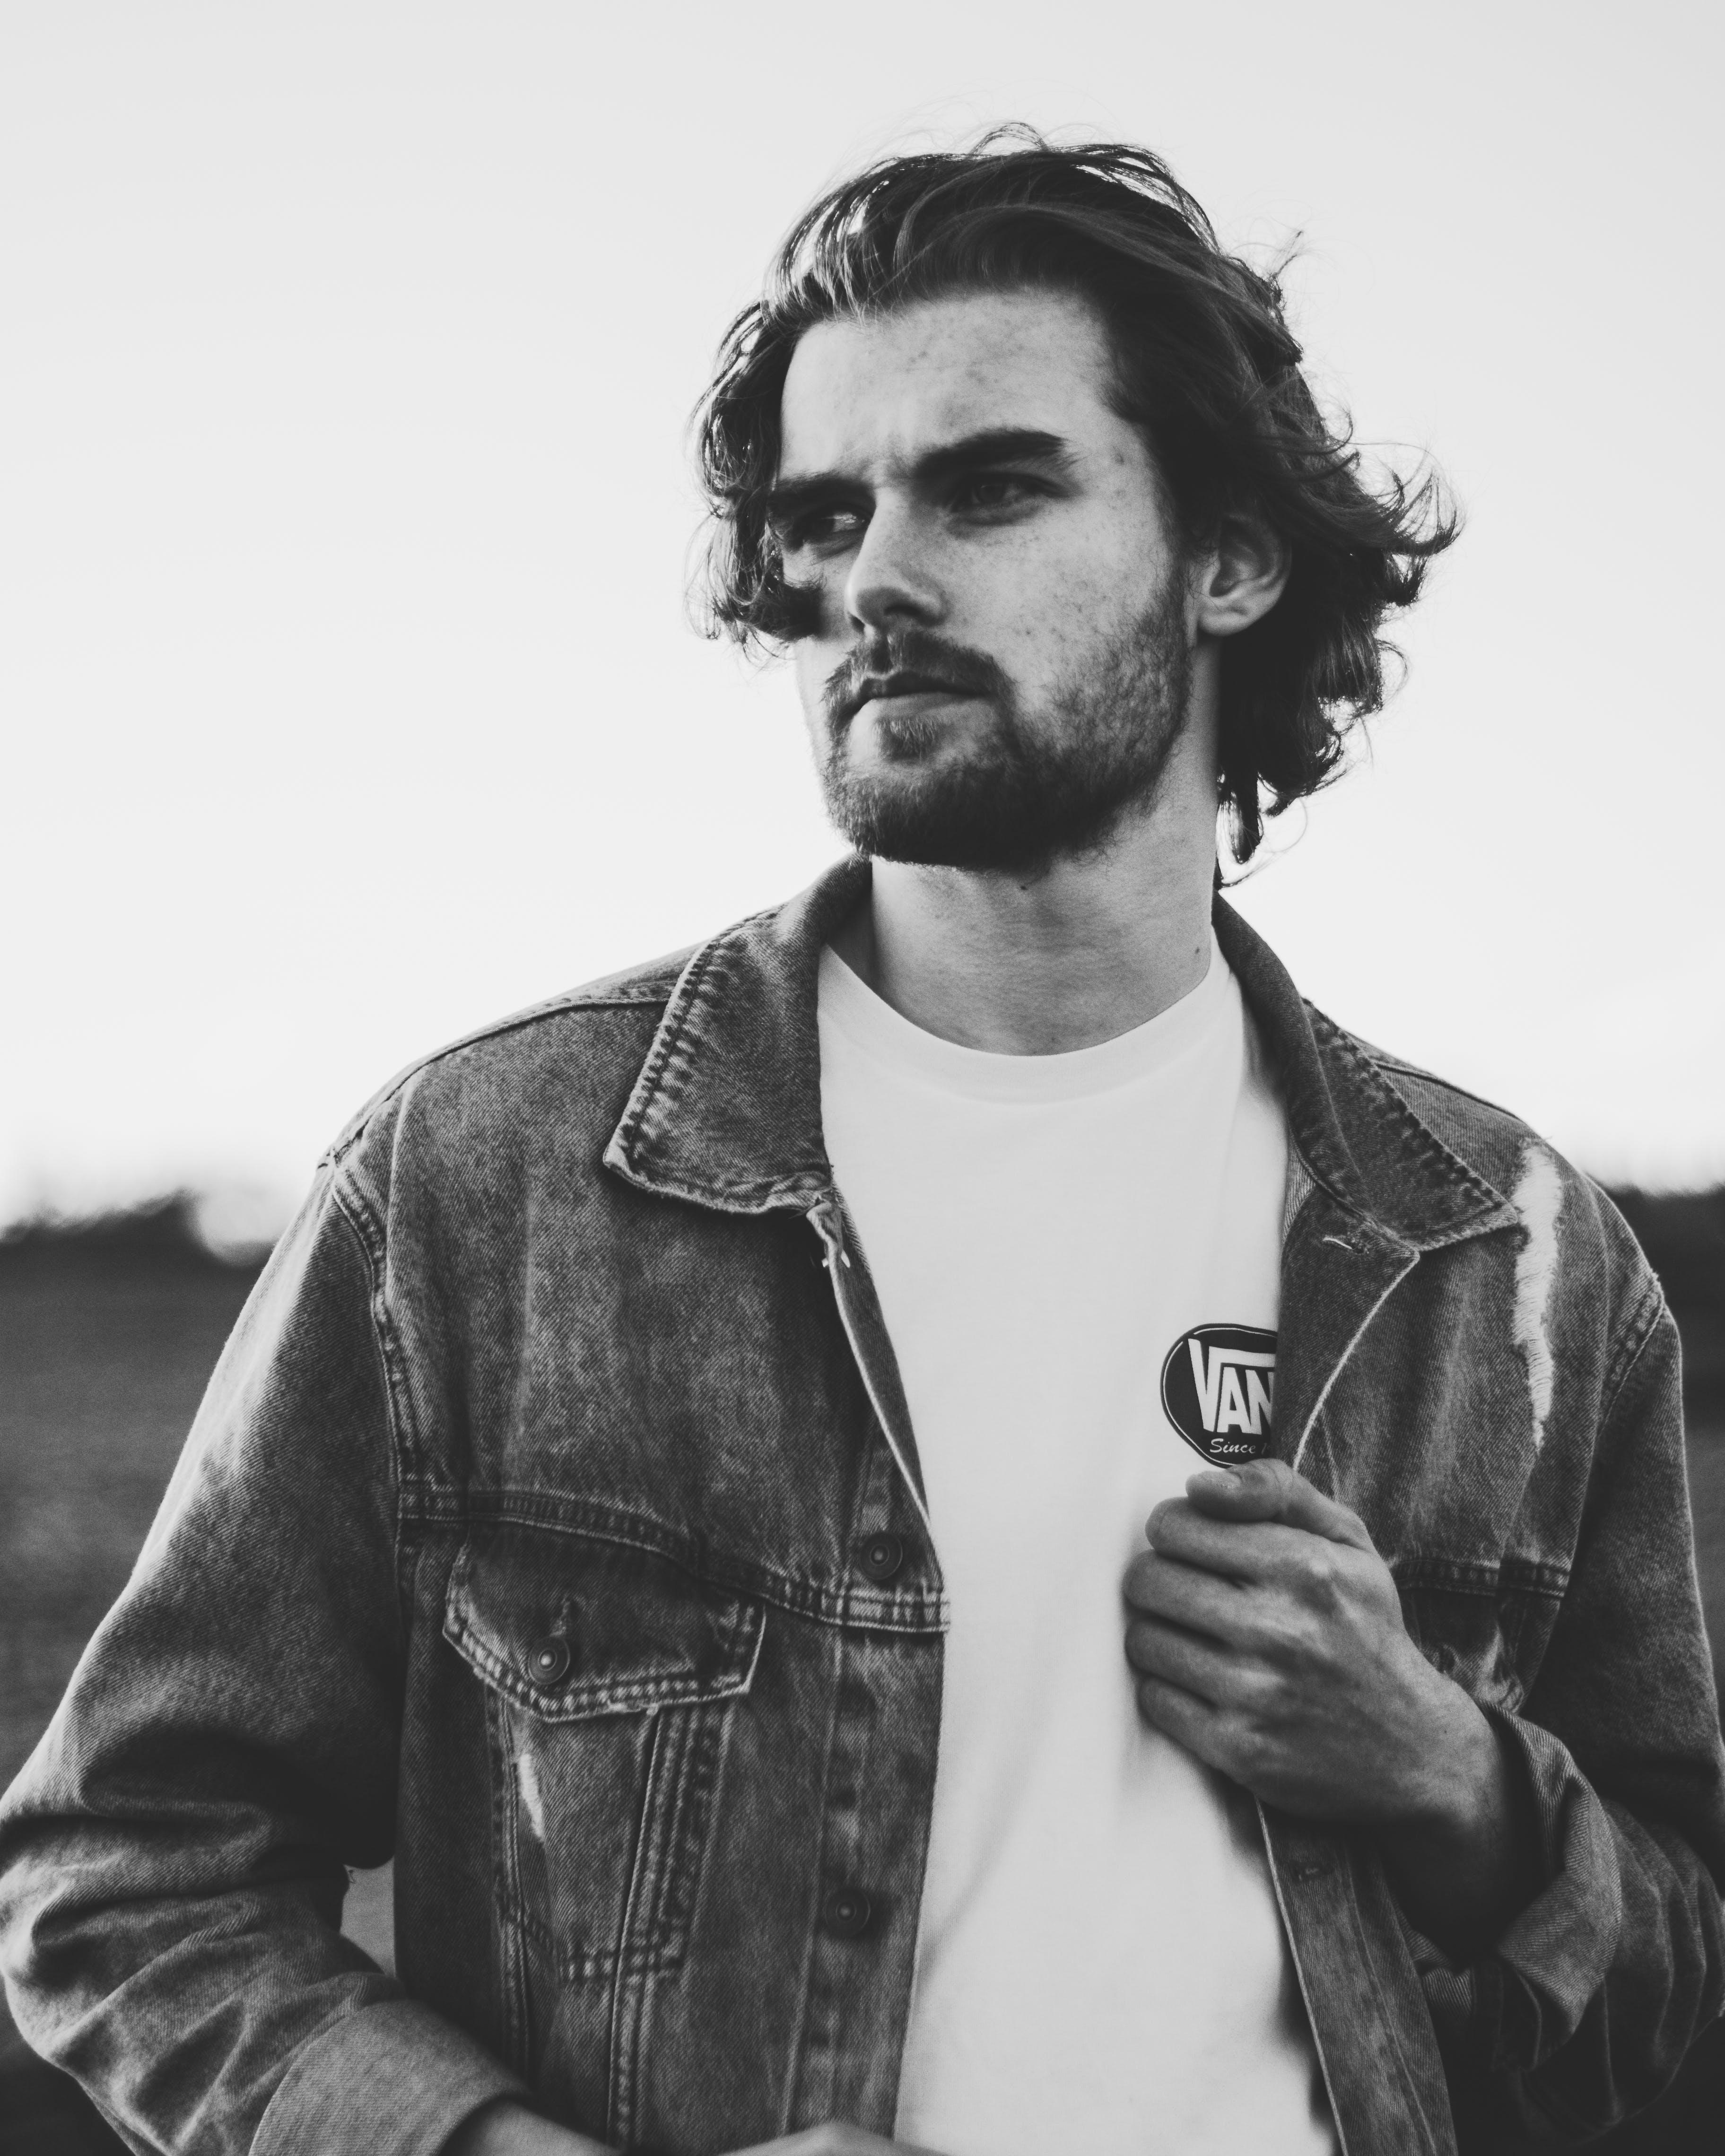 Grayscale Photo of Man Wearing Denim Jacket